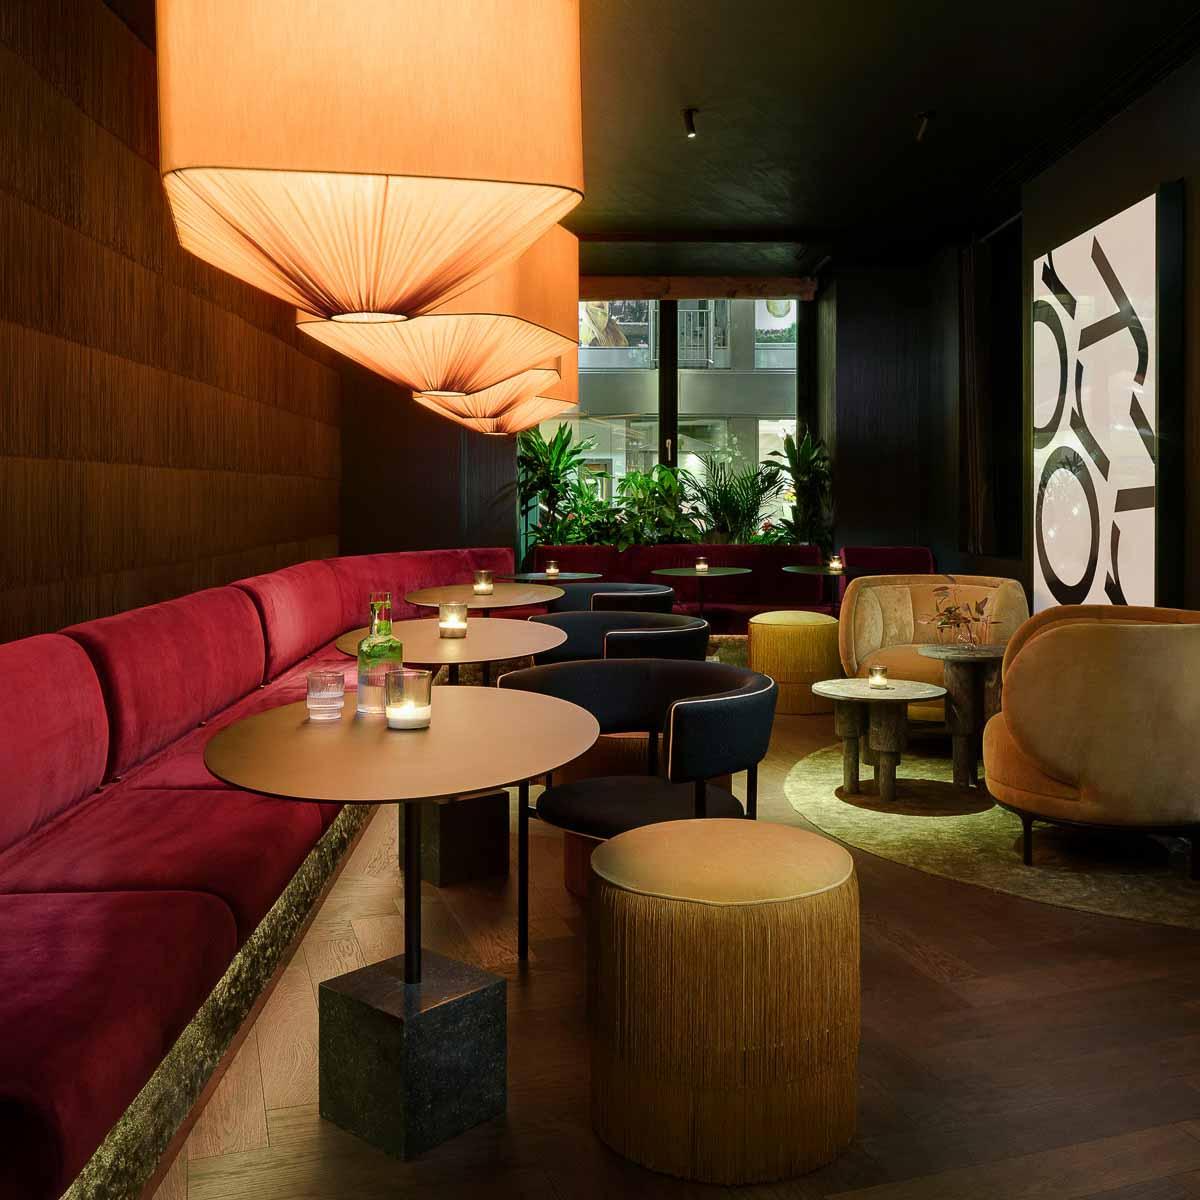 Ory Bar im Hotel Mandarin Oriental in München